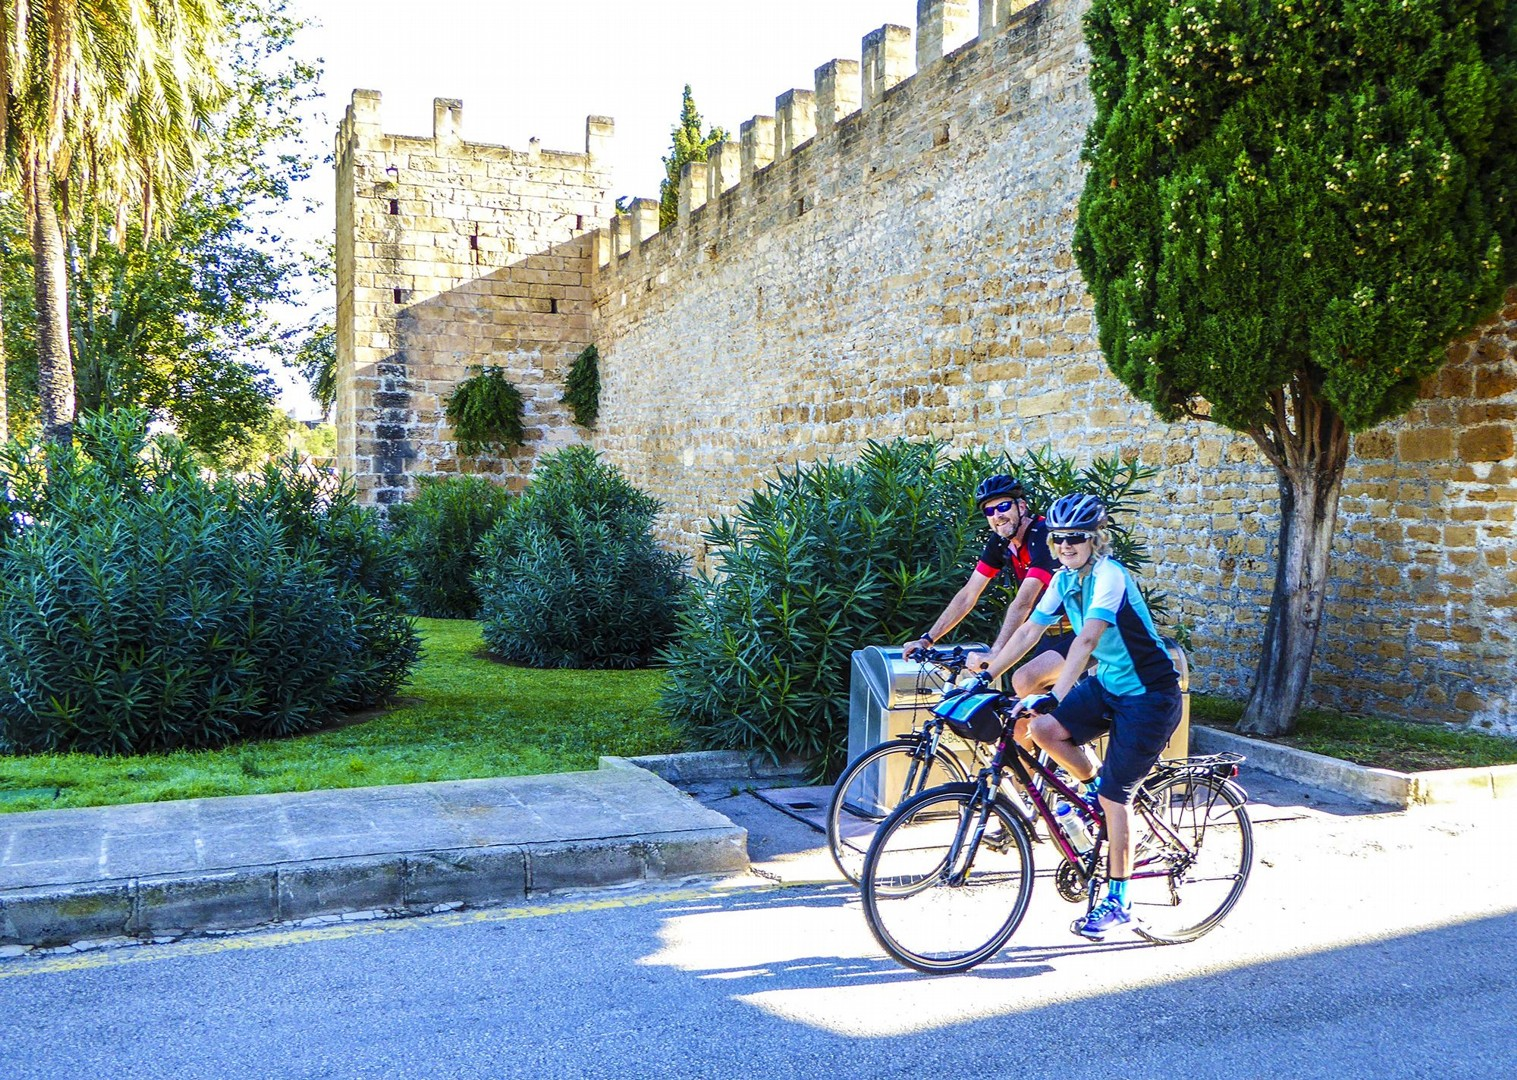 fun-self-guided-cycling-vacation-mallorca-spain-skedaddle.jpg - Spain - Mallorca - Self-Guided Leisure Cycling Holiday - Leisure Cycling